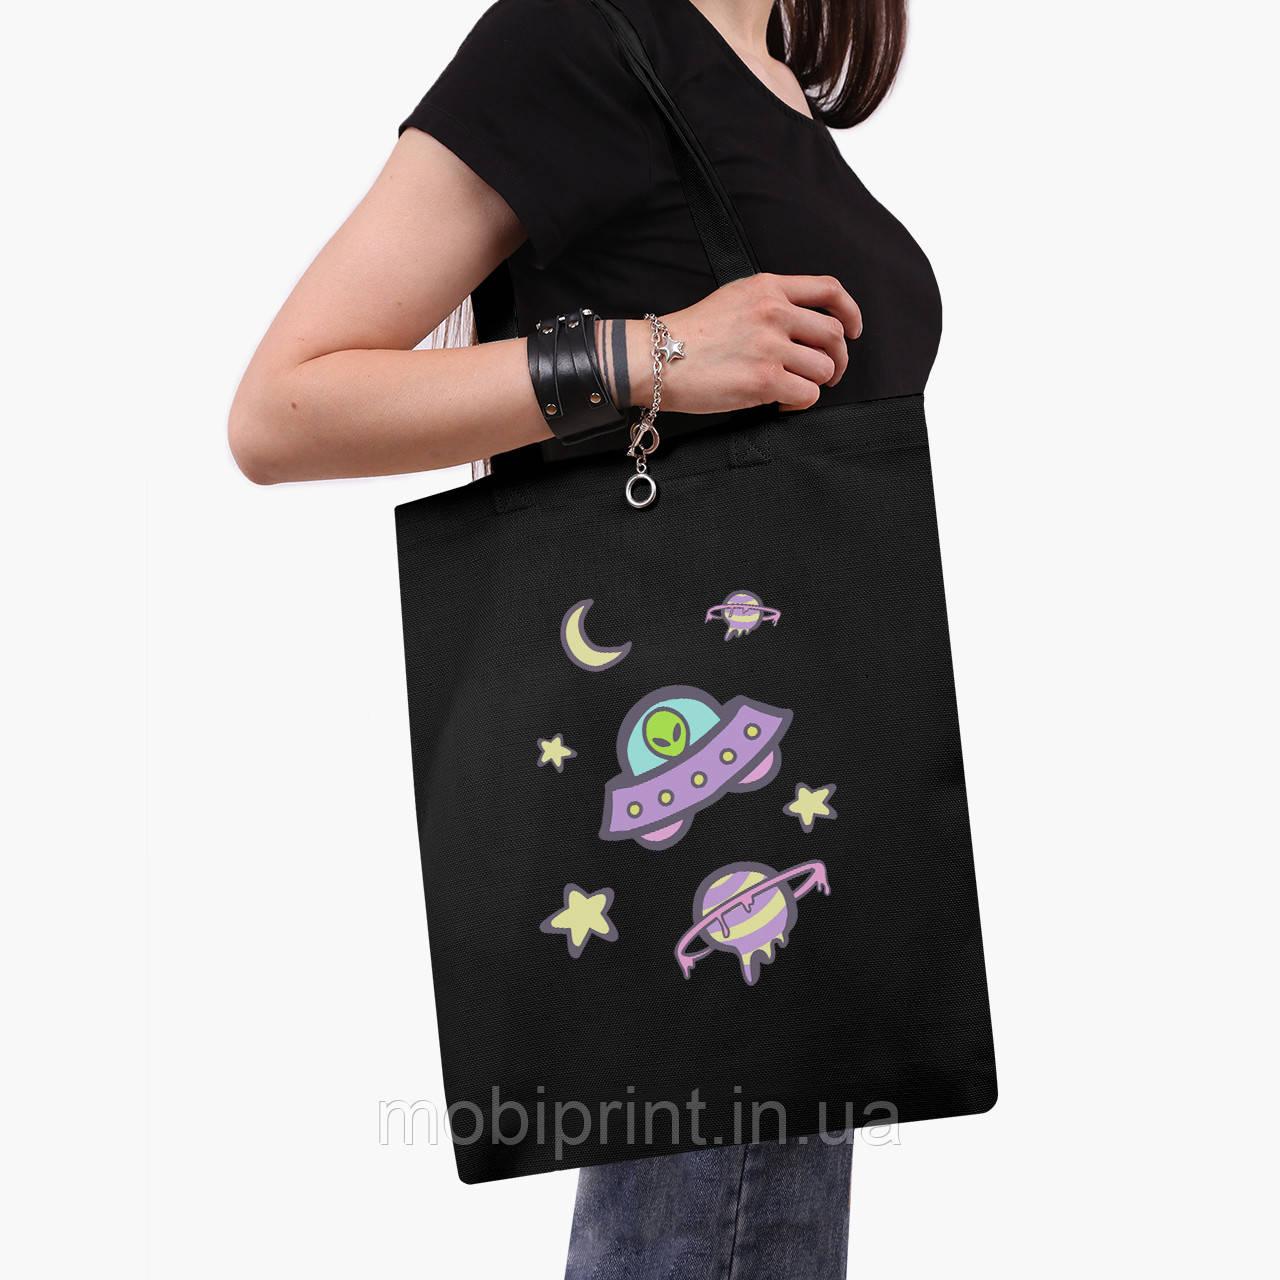 Еко сумка шоппер чорна Инопланетяни в космосі (Aliens in space) (9227-2854-2) 41*35 см